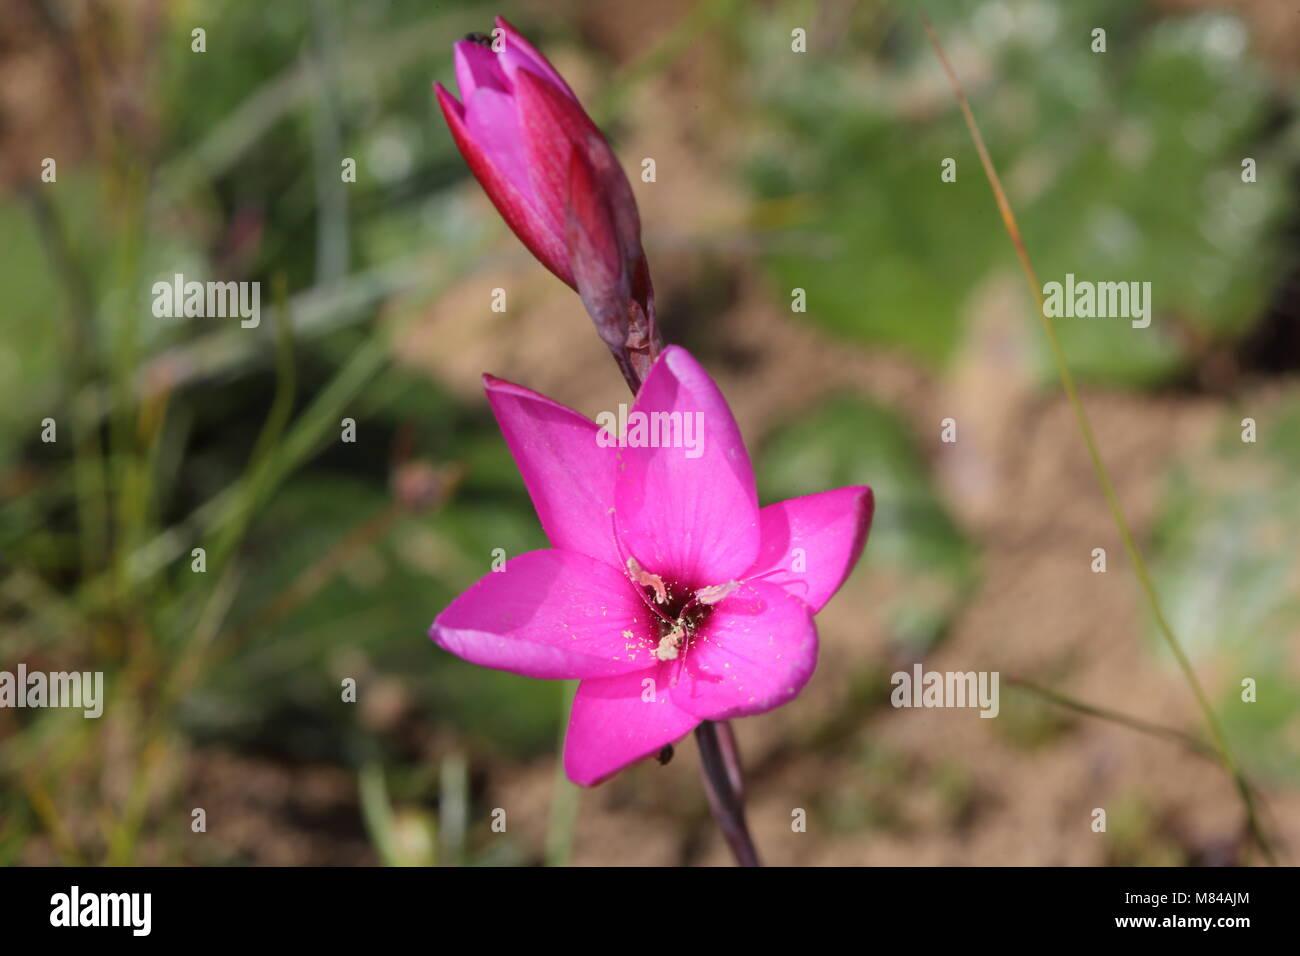 Hesperantha pauciflora - Stock Image